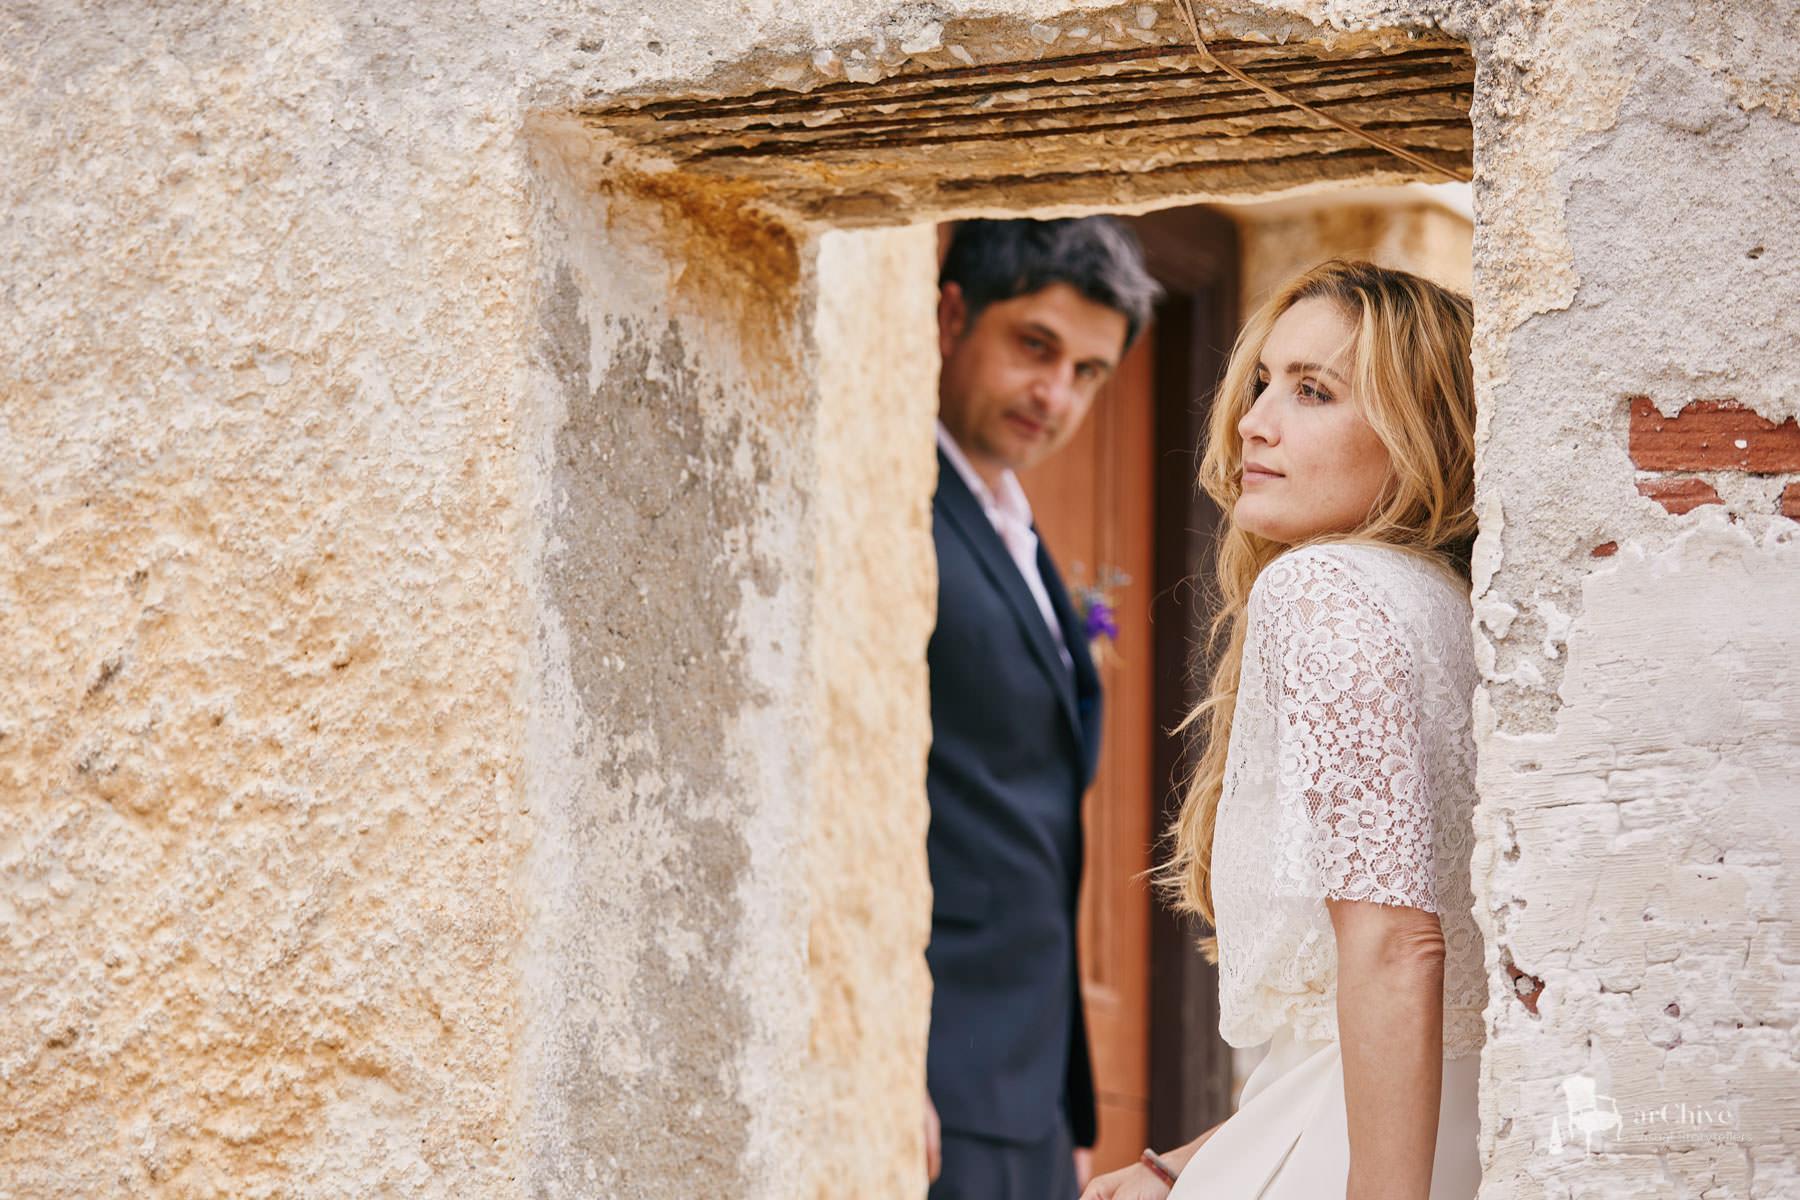 romantic wedding destination greece naxos